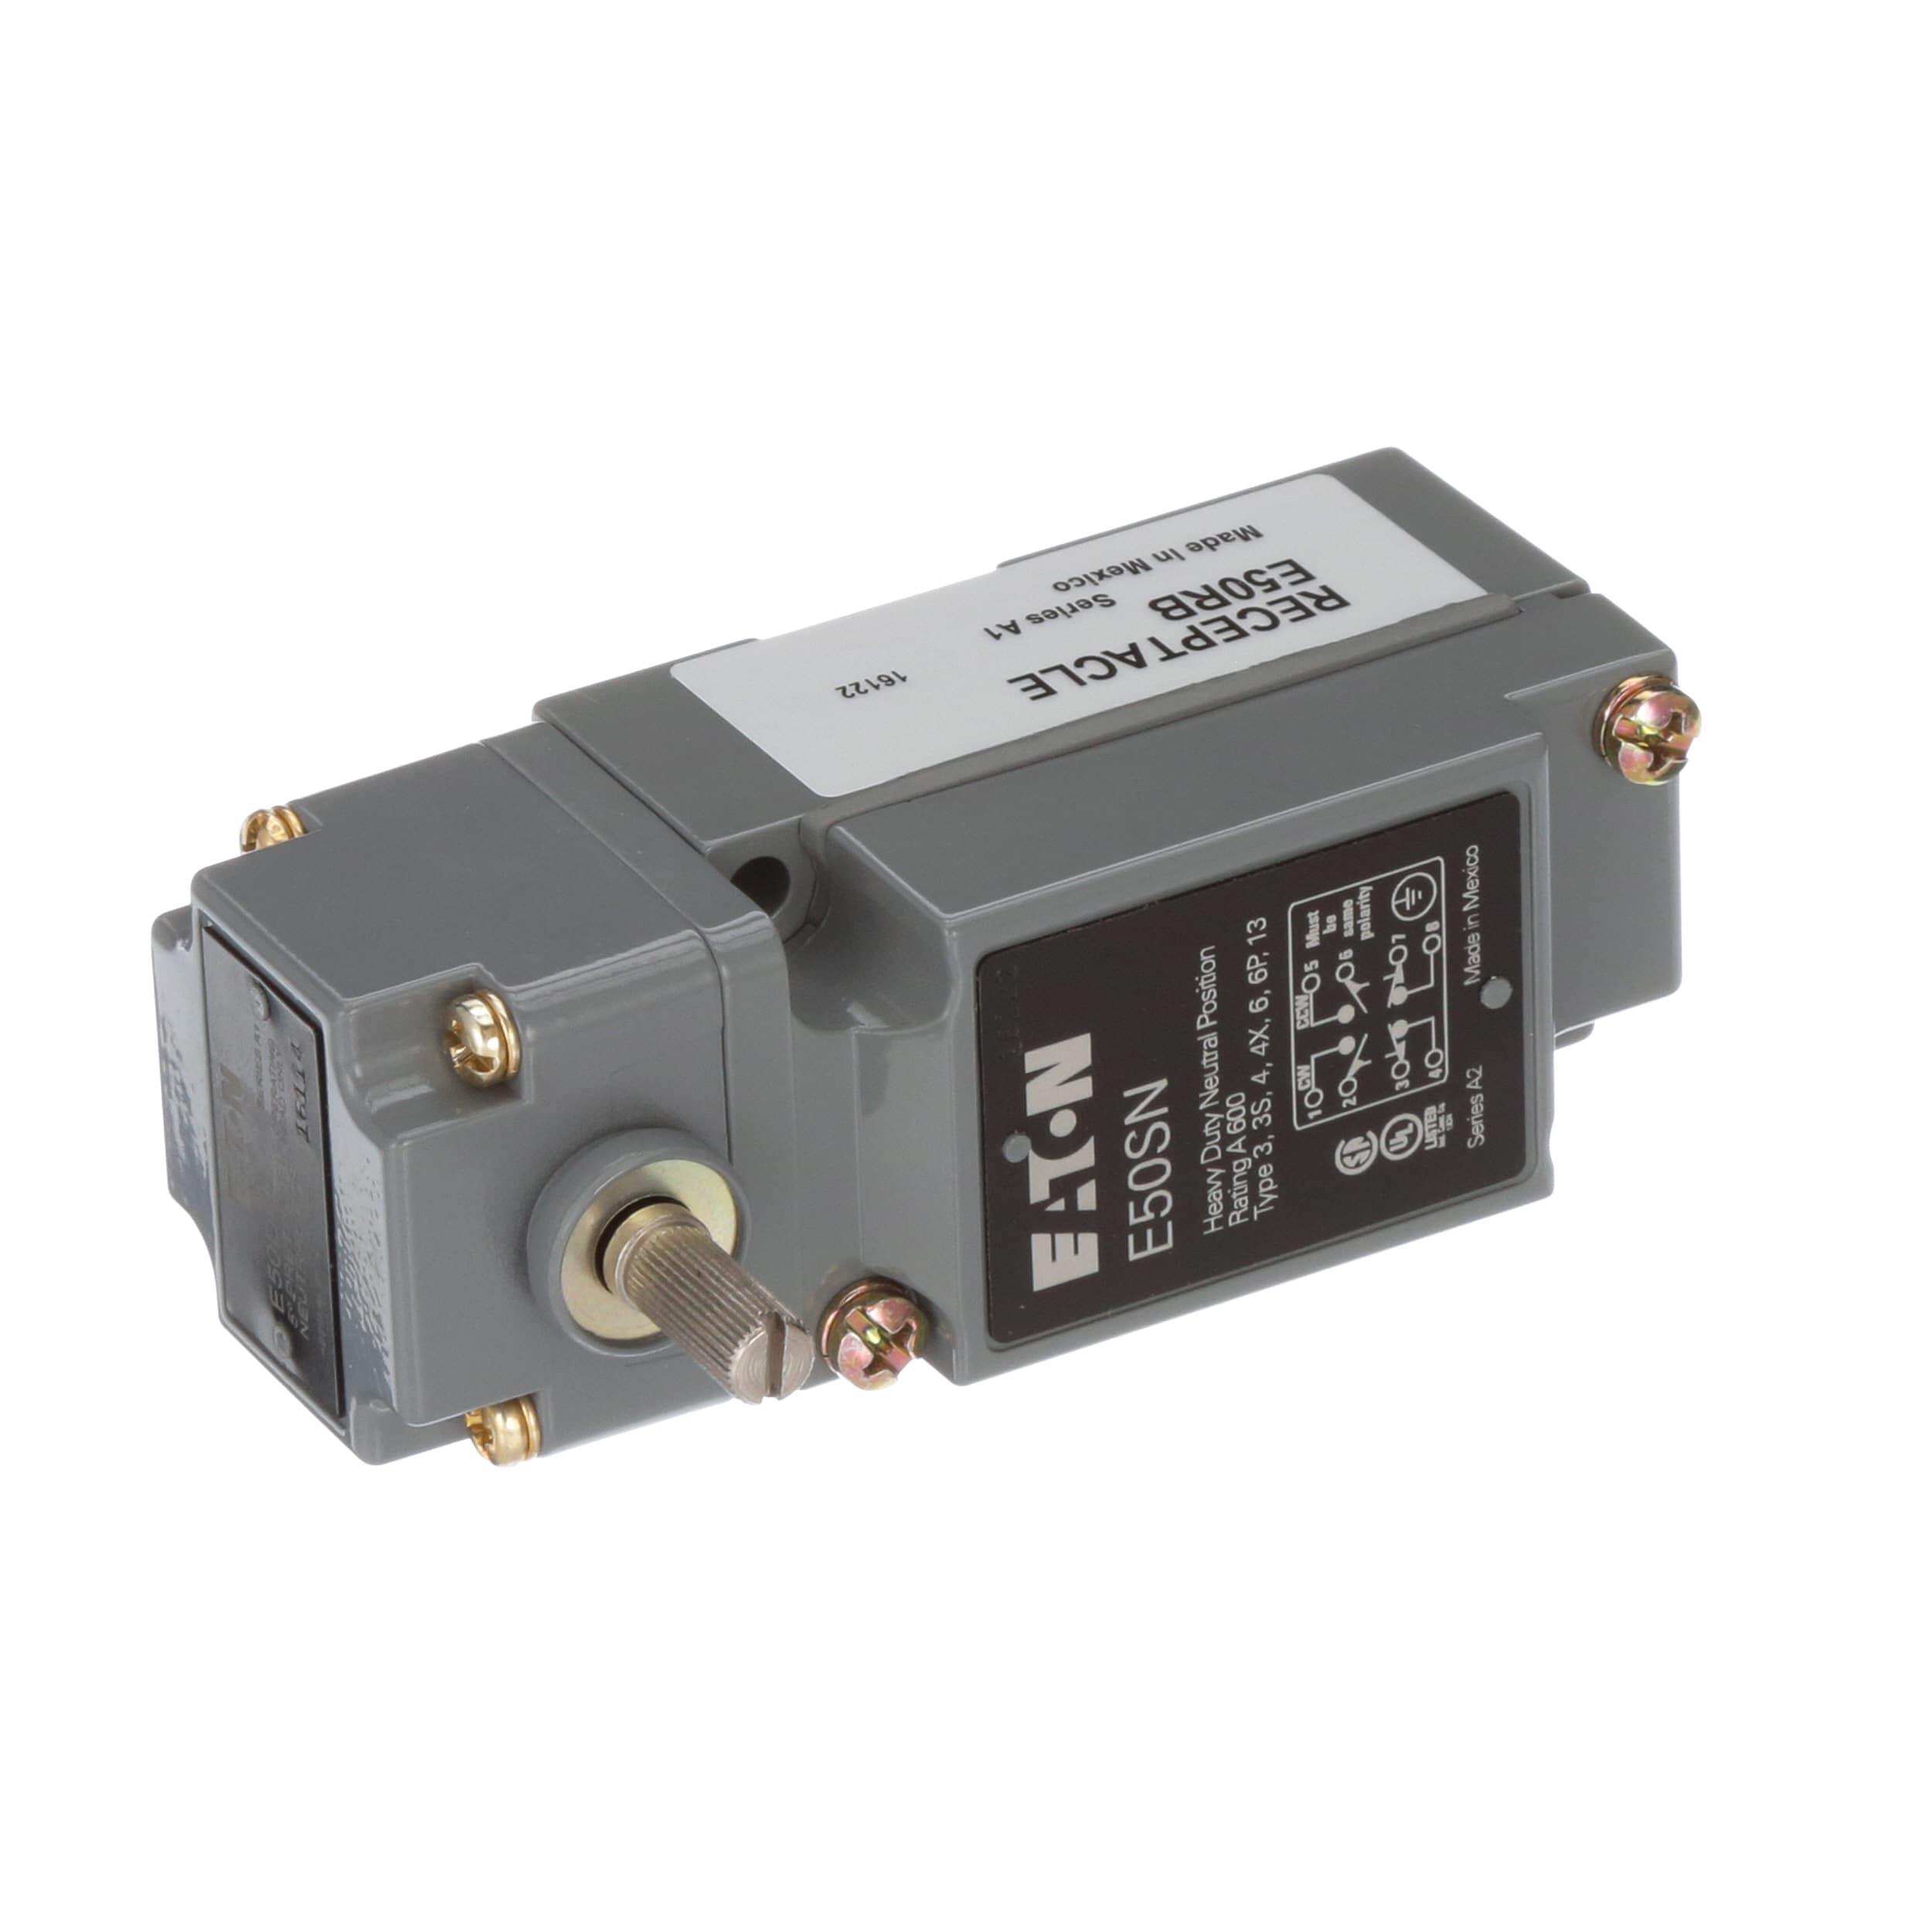 Eaton - Cutler Hammer - E50NN1 - E50 Heavy Duty Limit Switch ...